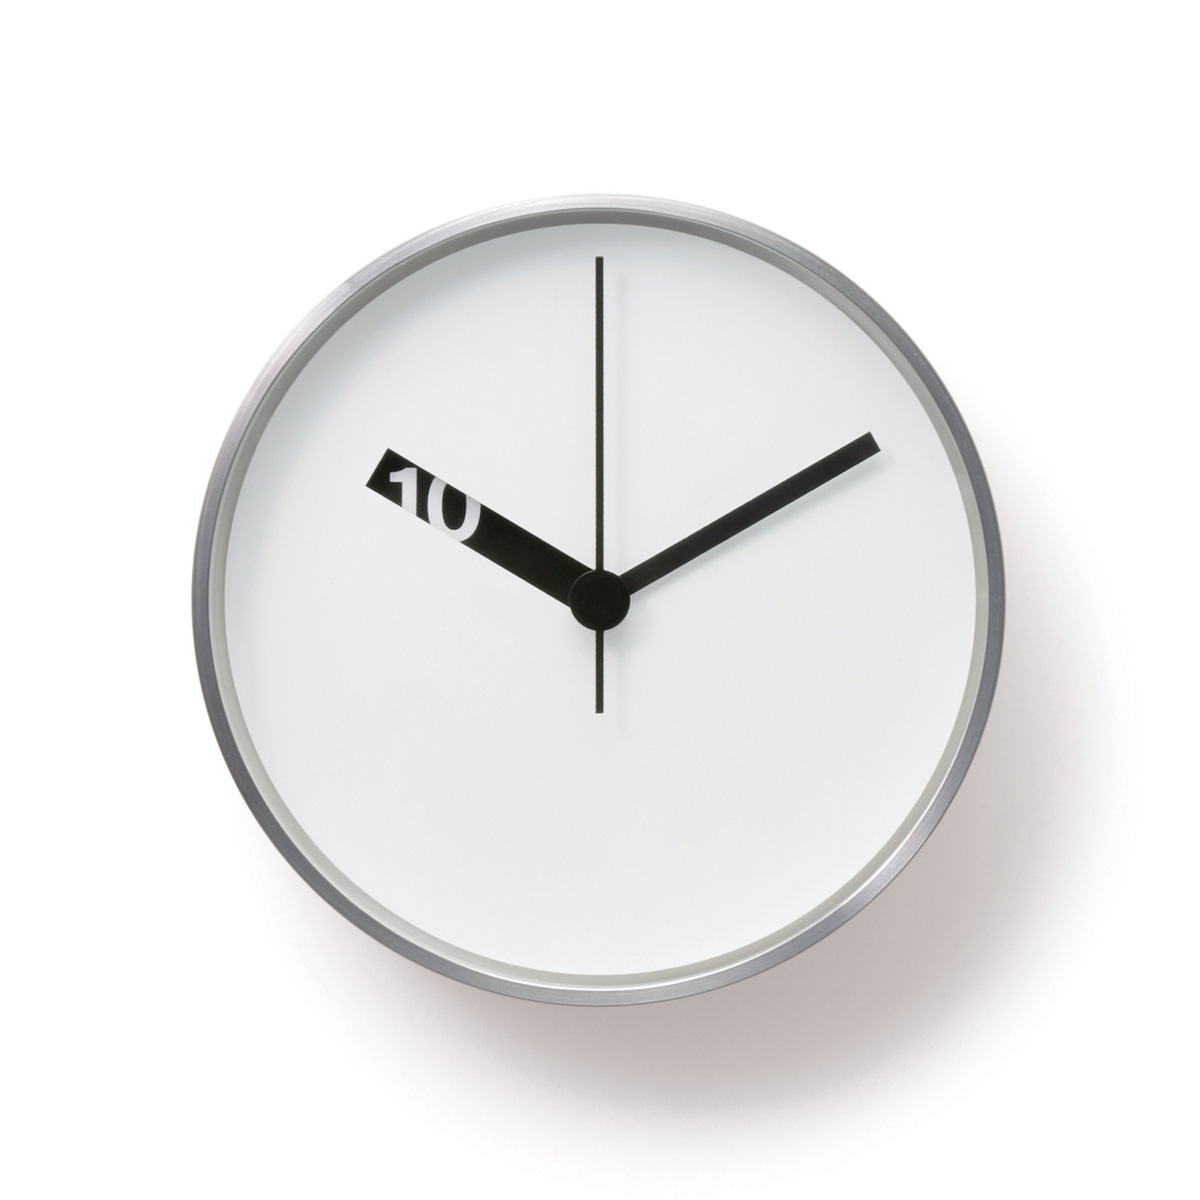 Ross McBride: Extra Normal Wall Clock White